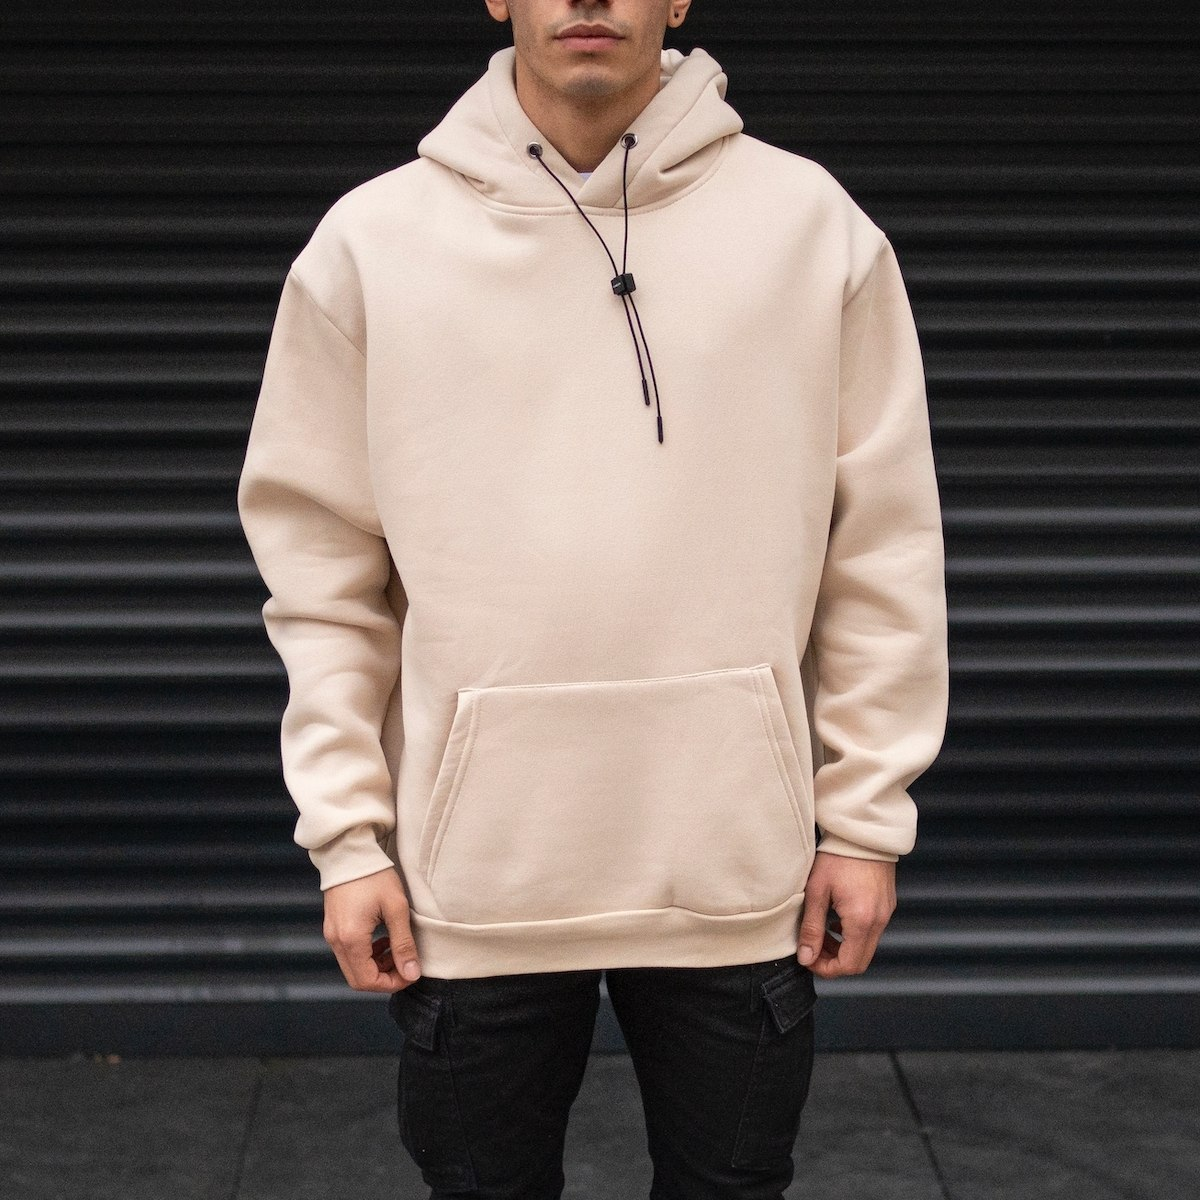 Men's Oversize Basic Hoodie Sweatshirt With Kangaroo Pocket In Cream